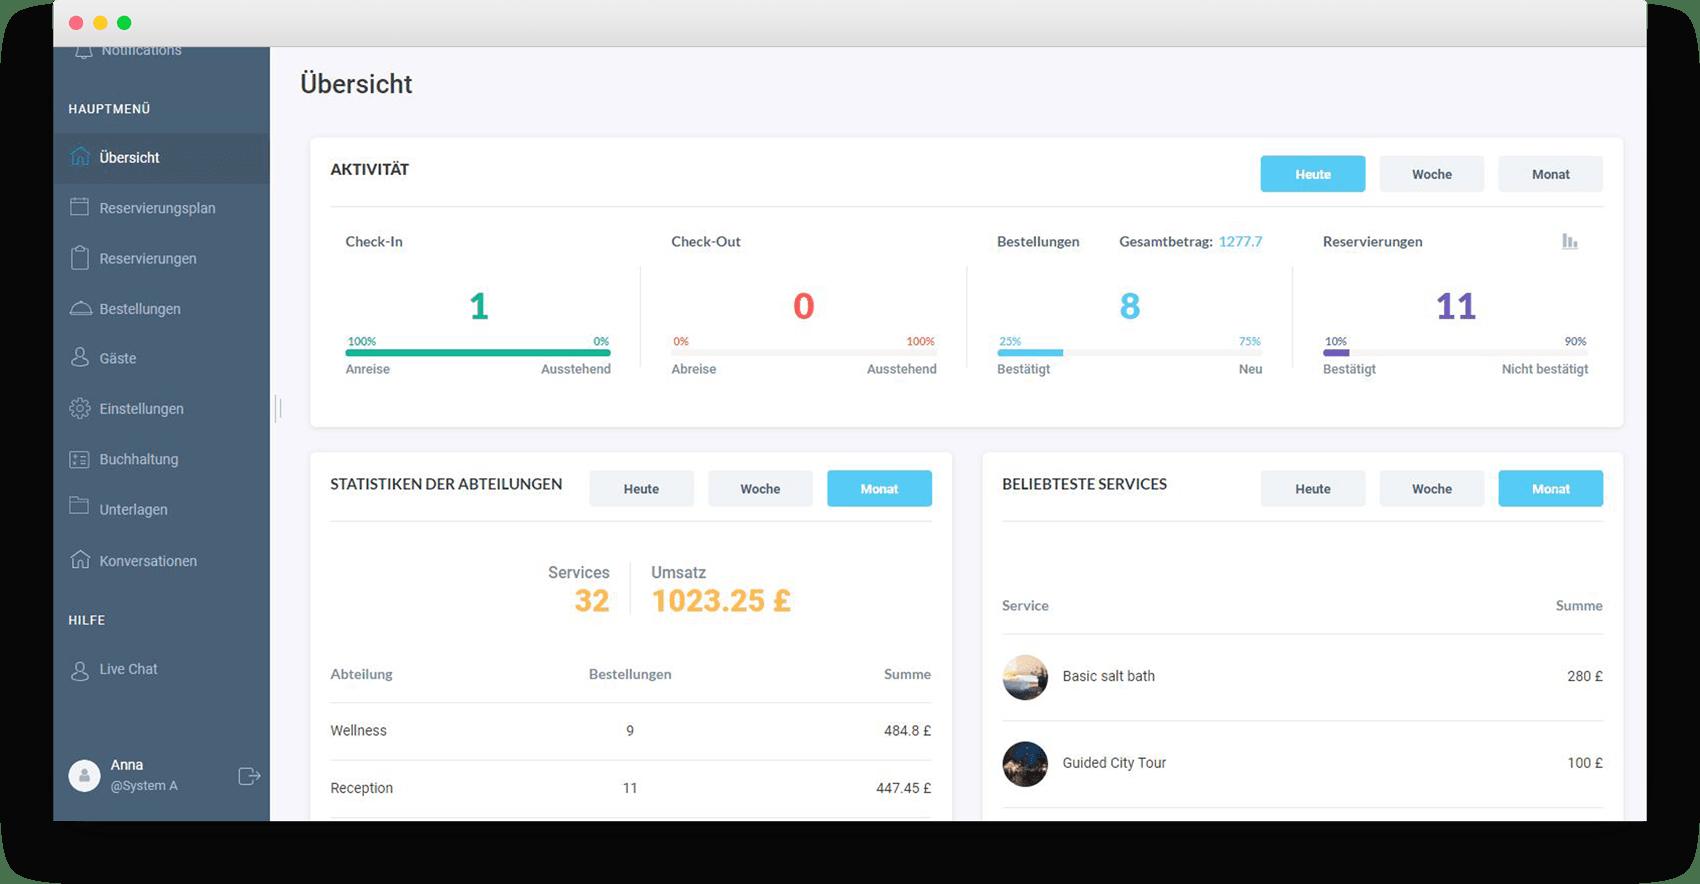 Live Chat - HotelFriend Portal